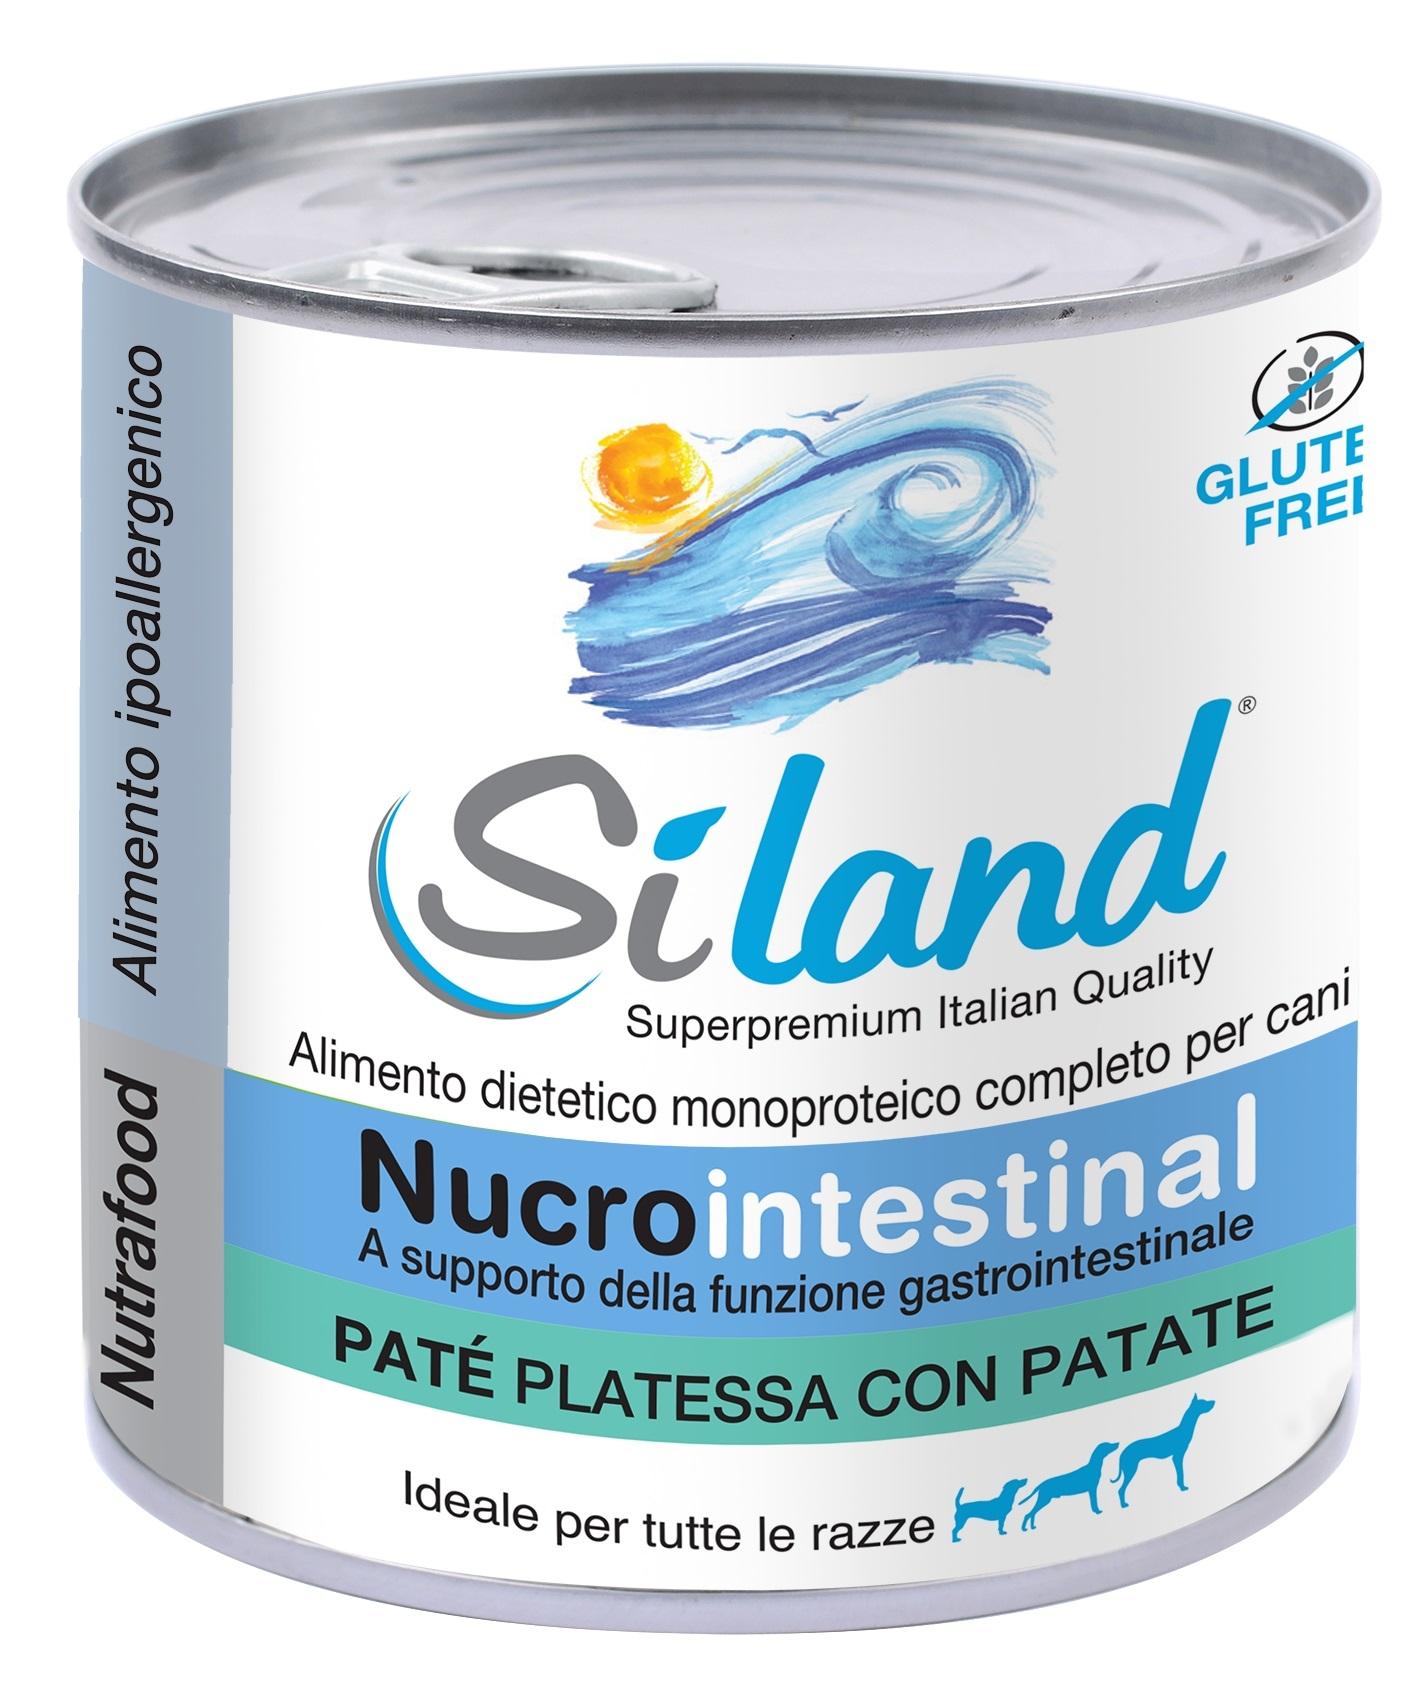 SILAND nucrointestinal PATE PLATESSA CON PATATE A